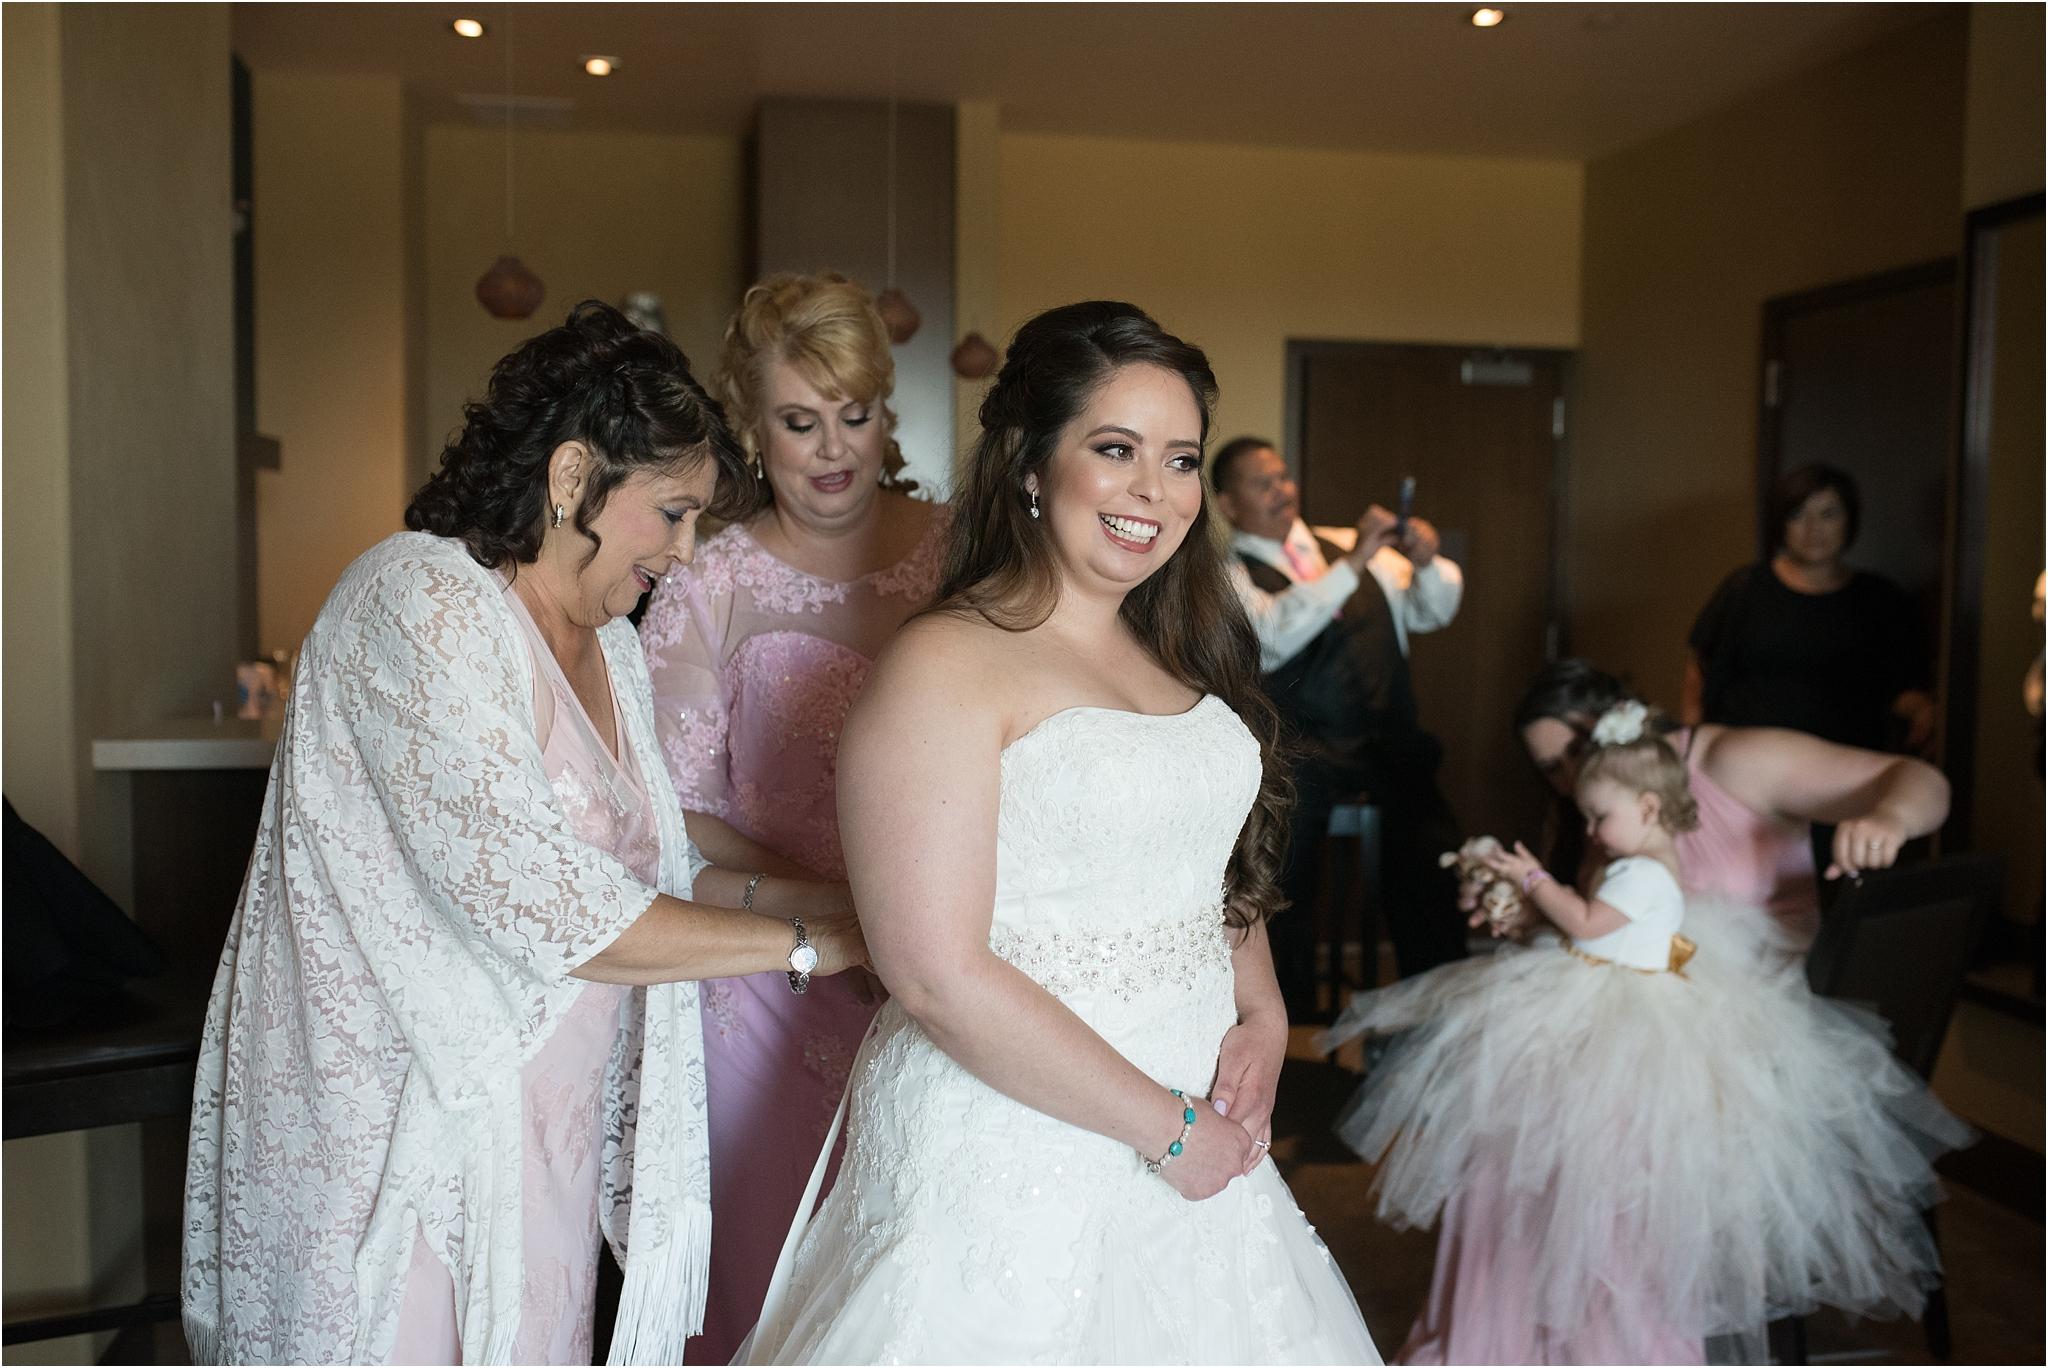 kayla kitts photography - isleta casino wedding - albuquerque wedding photographer - new mexico wedding photographer - de novo pastoral_0009.jpg